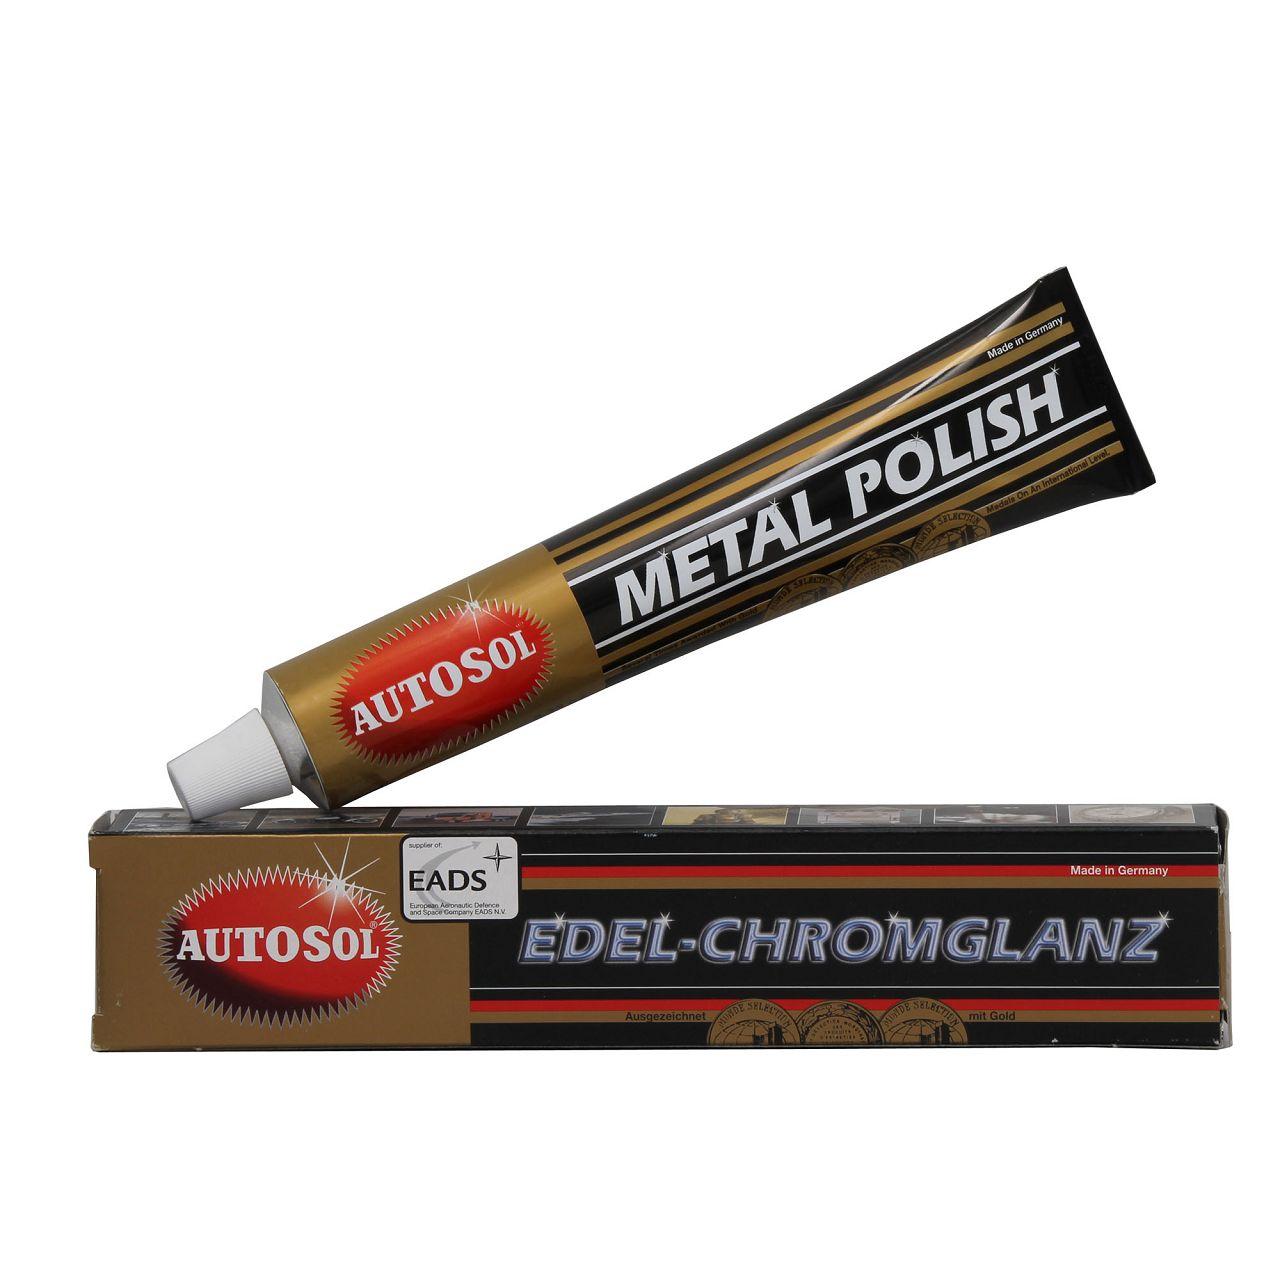 AUTOSOL Metal Polish Alu Metal Chrom Politur Polierpaste EDEL Chromglanz 75ML